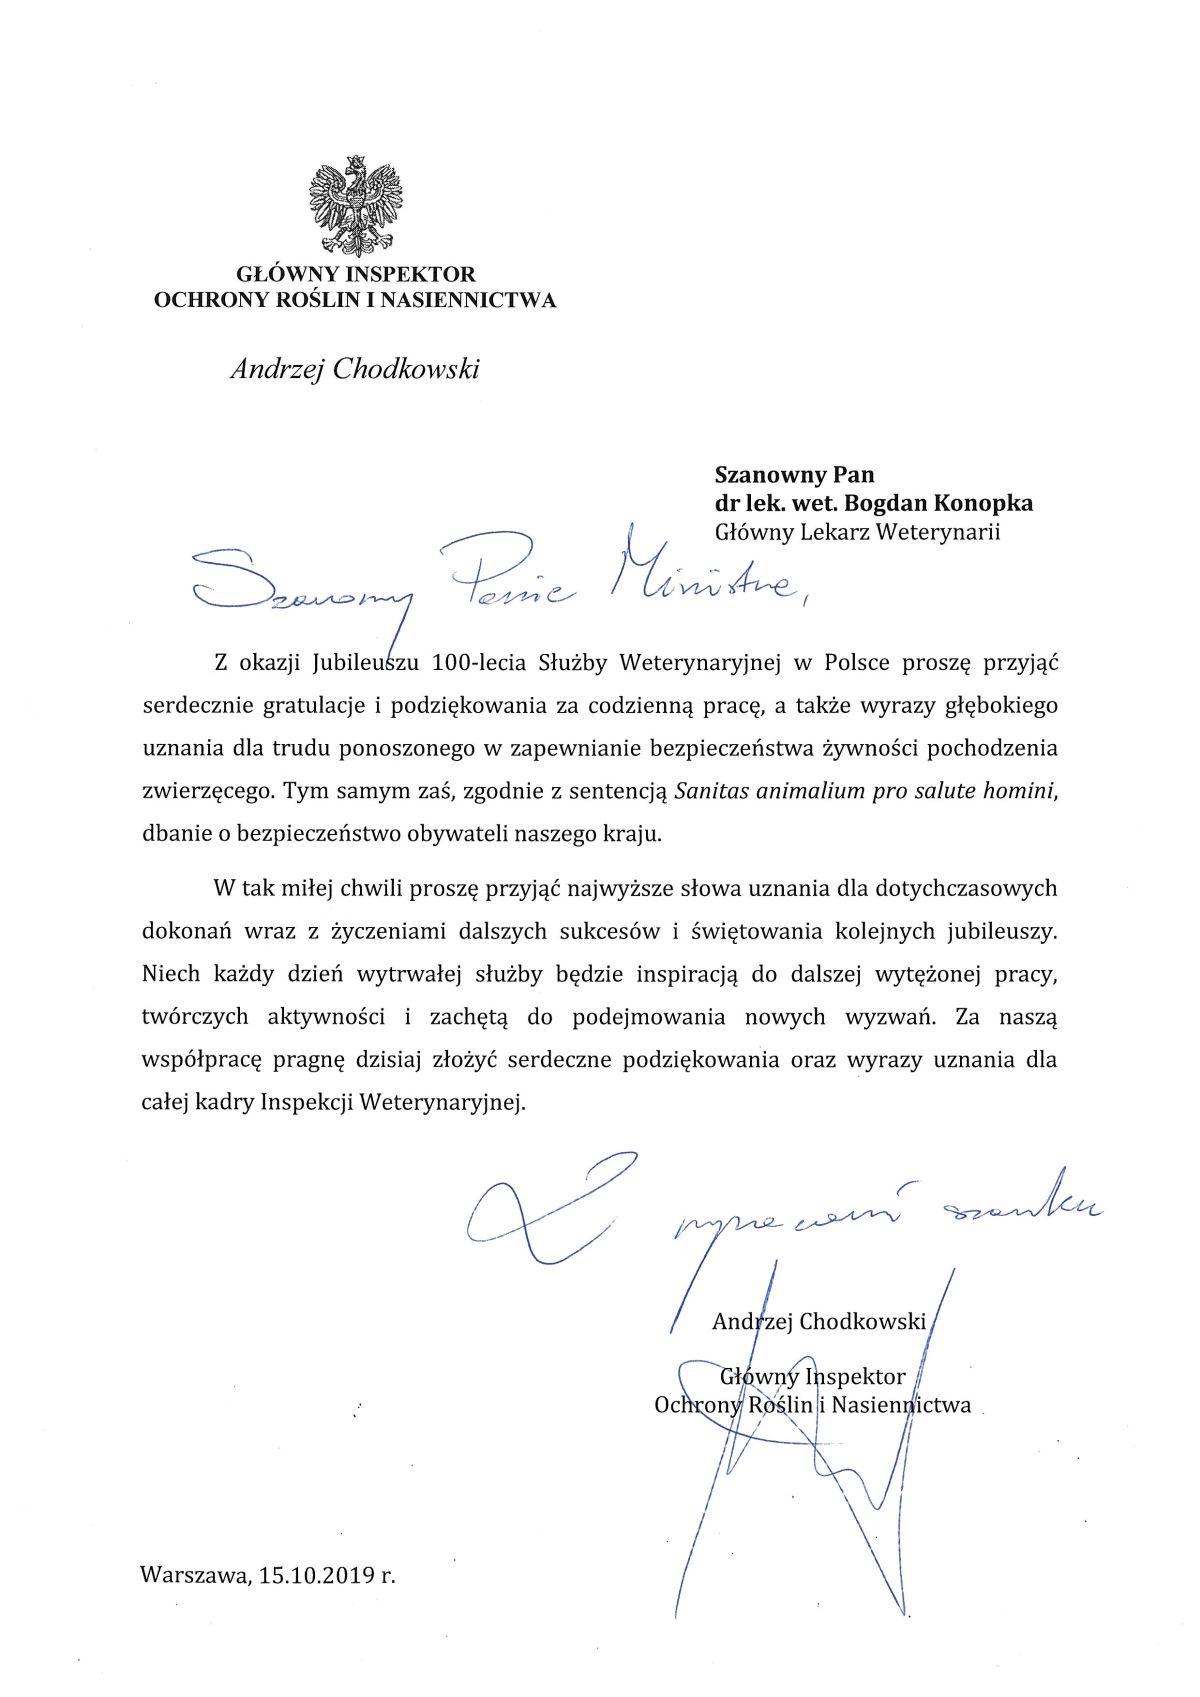 Obchody 100-lecia Polskiej Administracji Weterynaryjnej